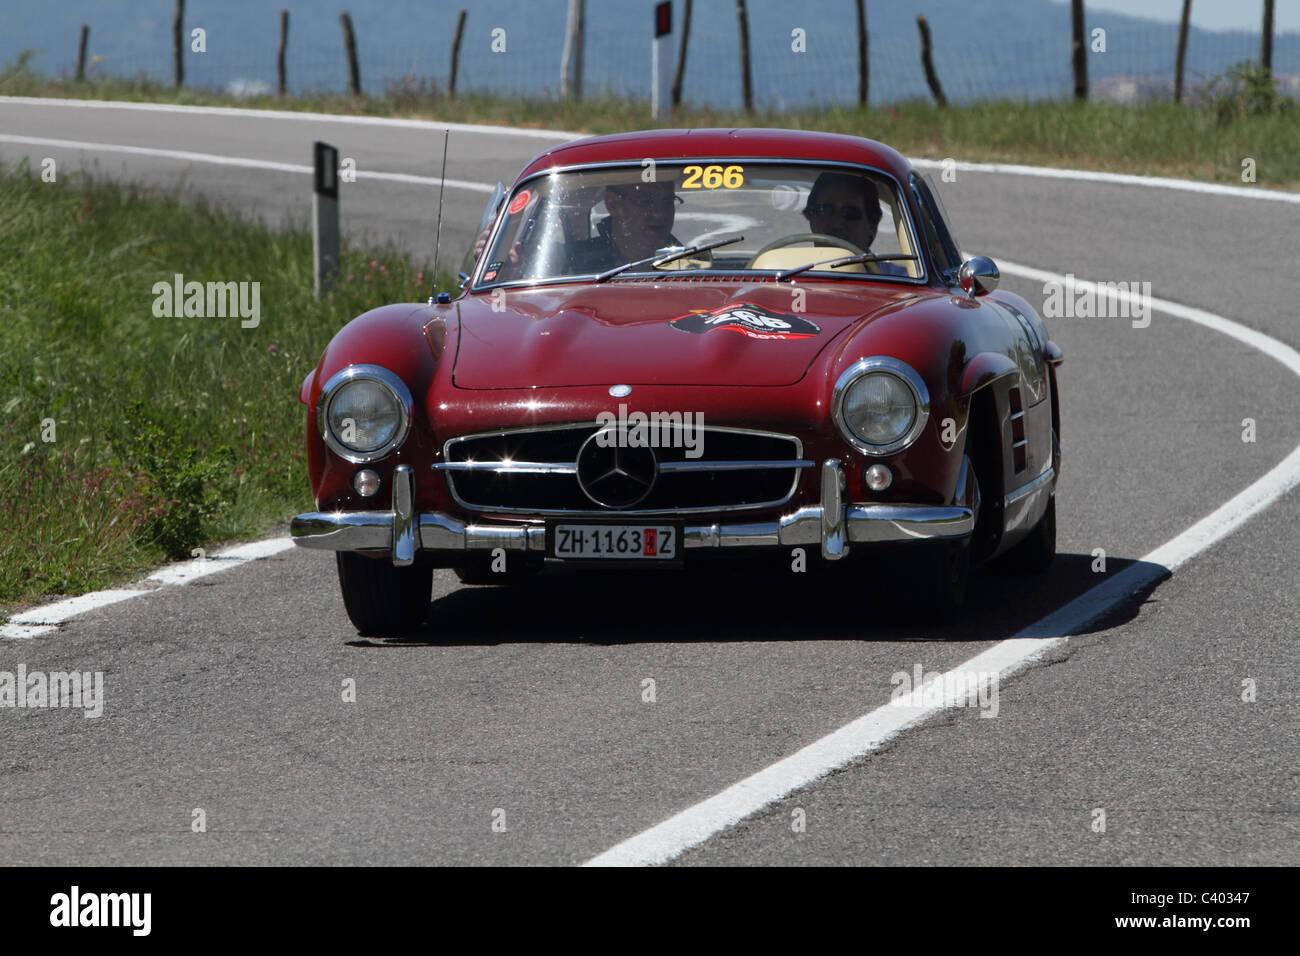 Mille Miglia 2011 Mercedes - Stock Image